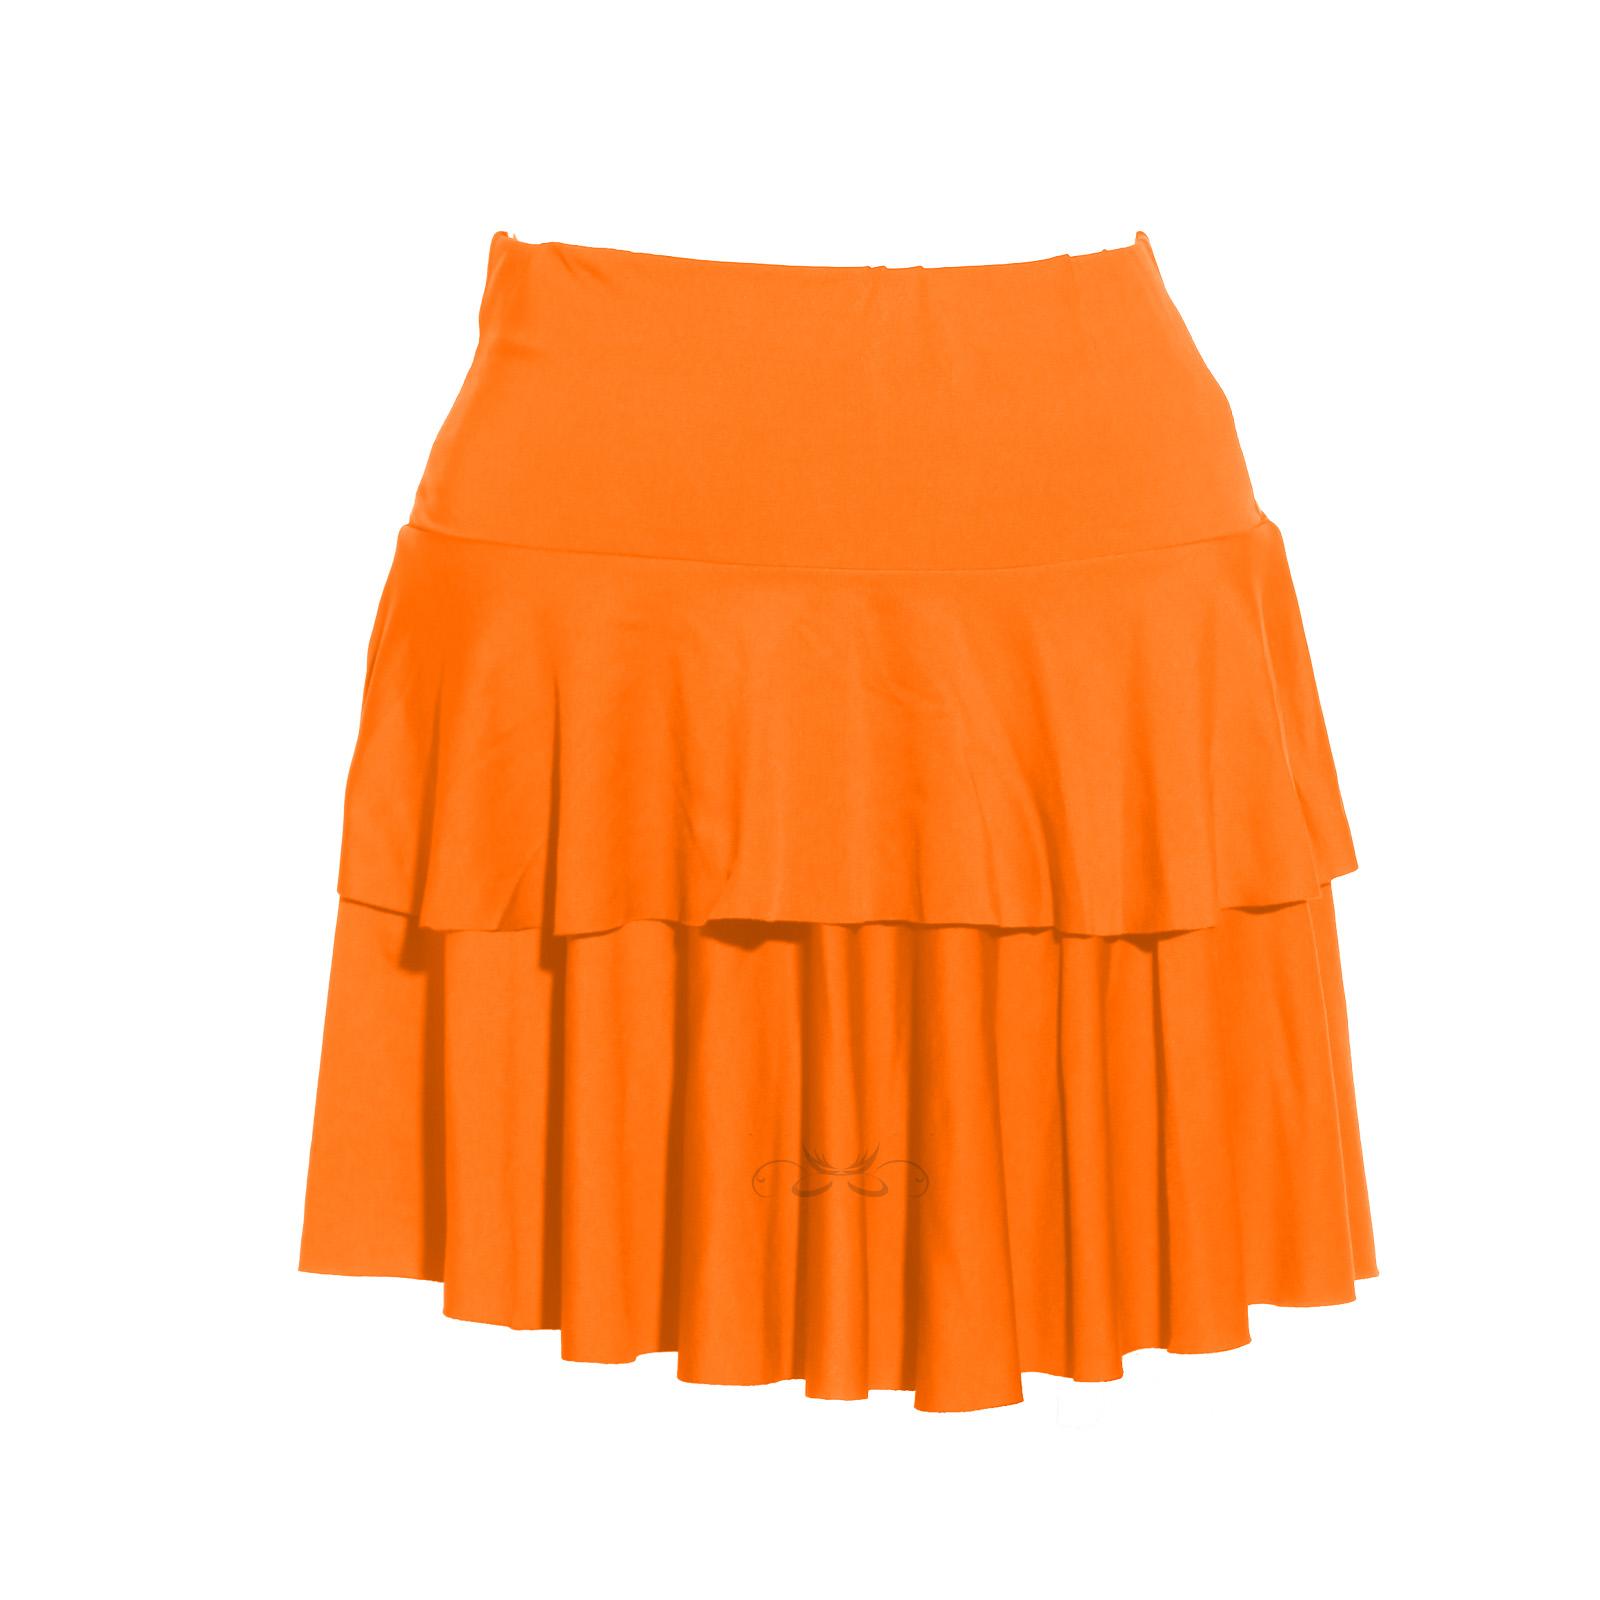 damen minirock partyrock sportrock sommerrock laufrock kurz orange rock ebay. Black Bedroom Furniture Sets. Home Design Ideas